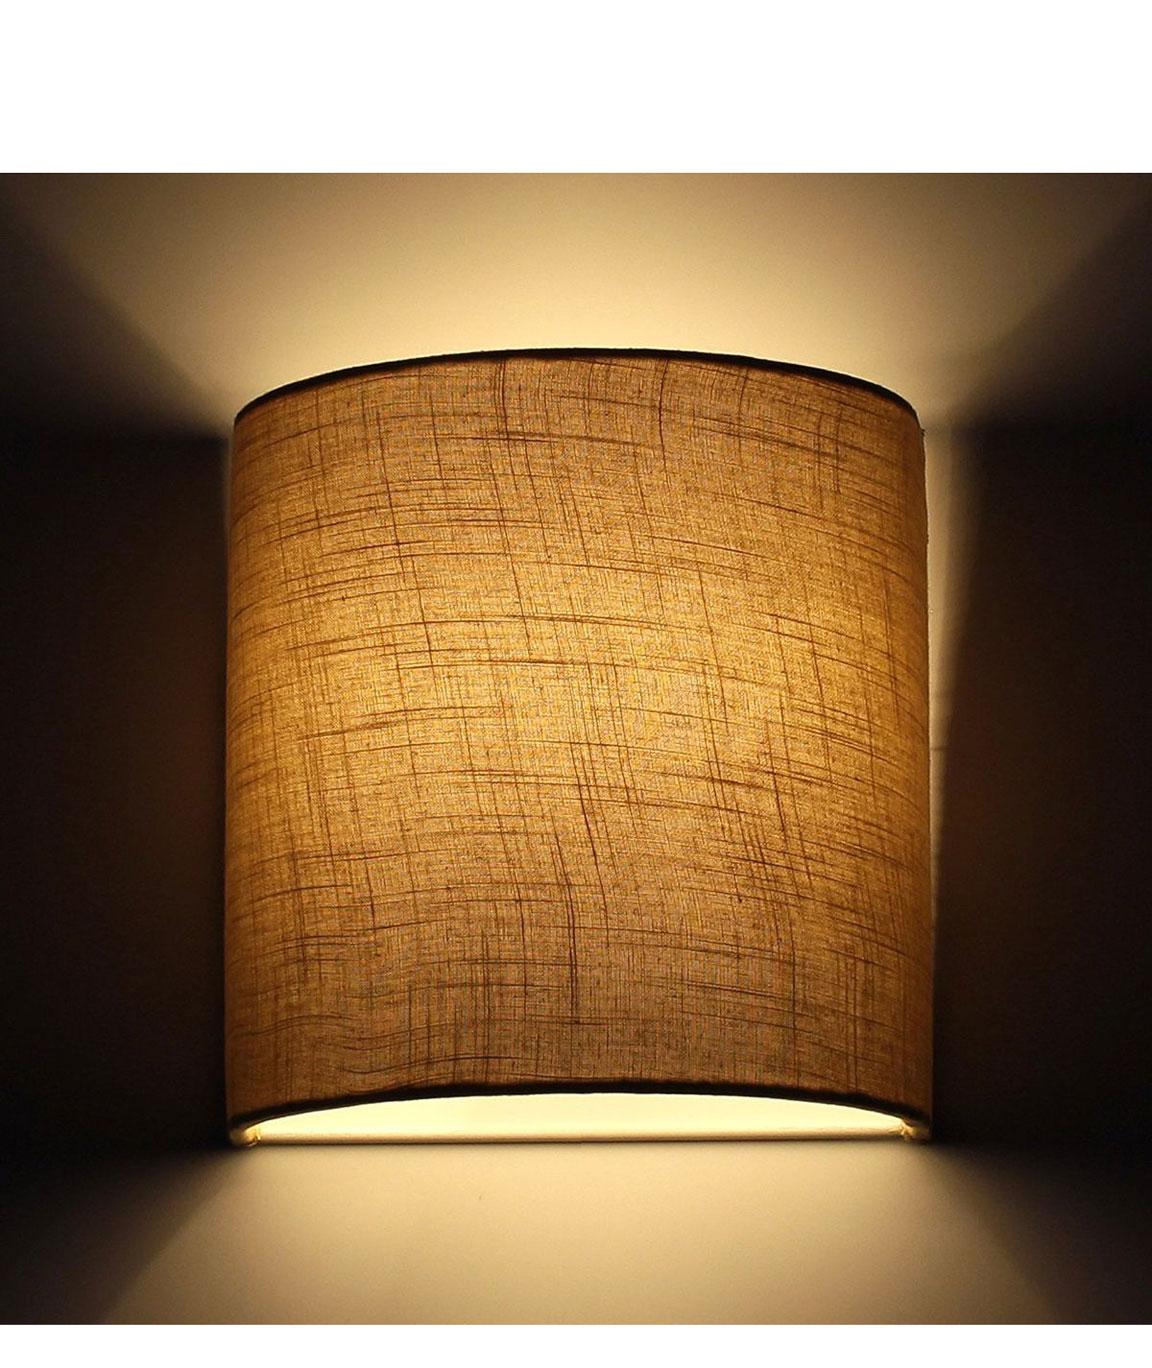 RDC 23 CMS Sand Brown Jute Half-Cylindrical Wall Hanging Lamp Shade